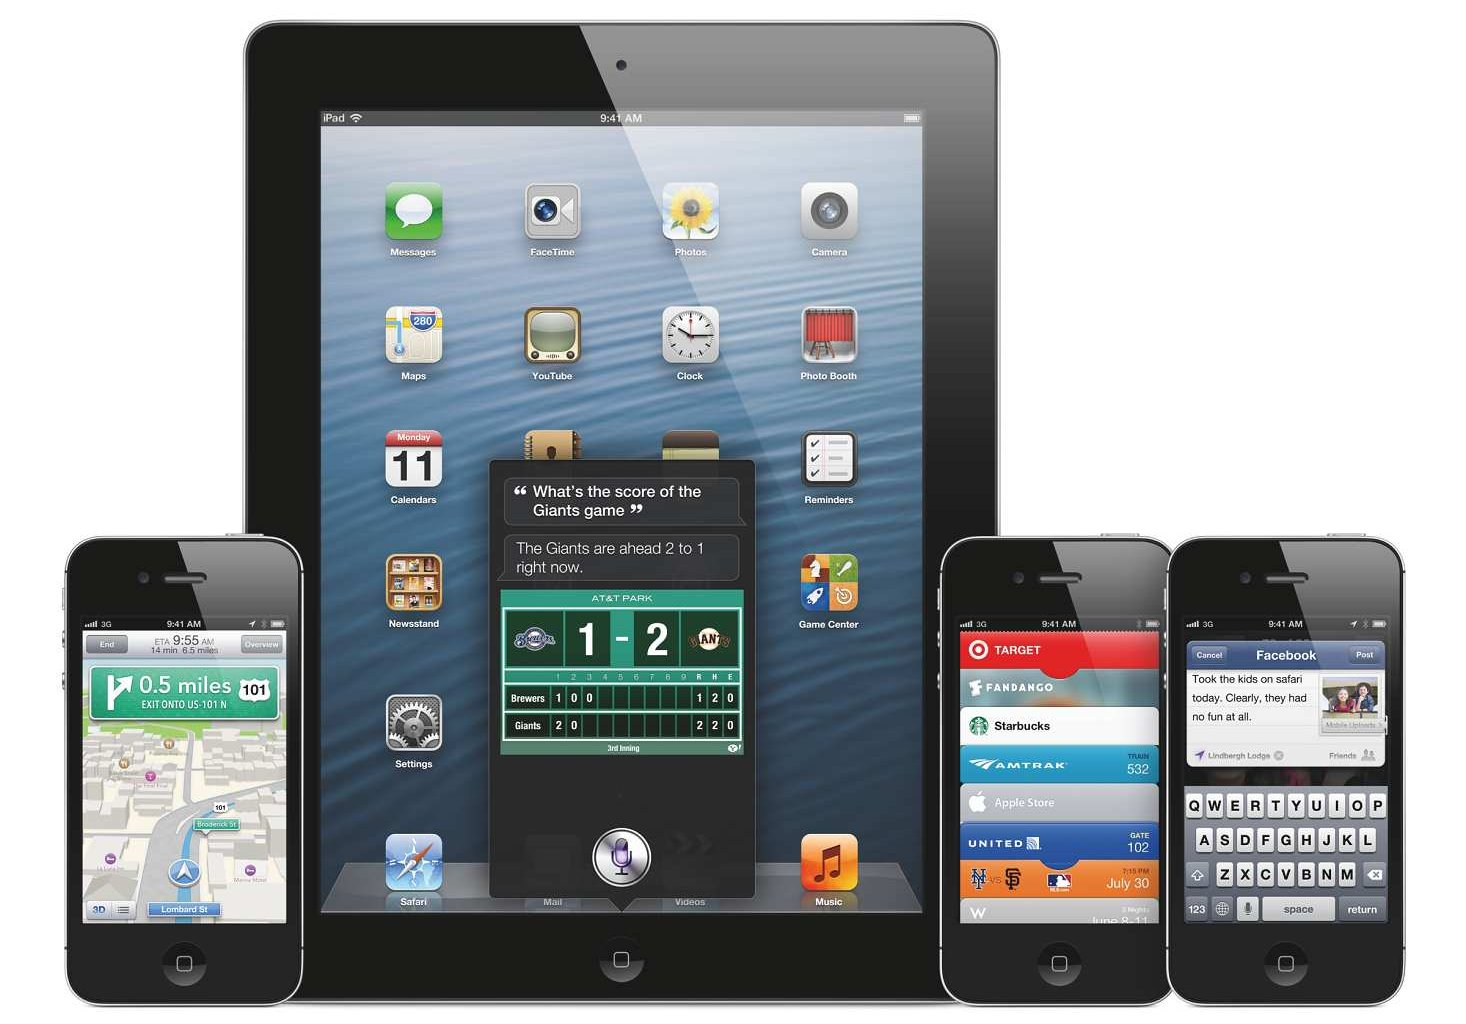 Skeumorfismus u iOS 6, poslední verze iOS, která toto rozhraní nabízela